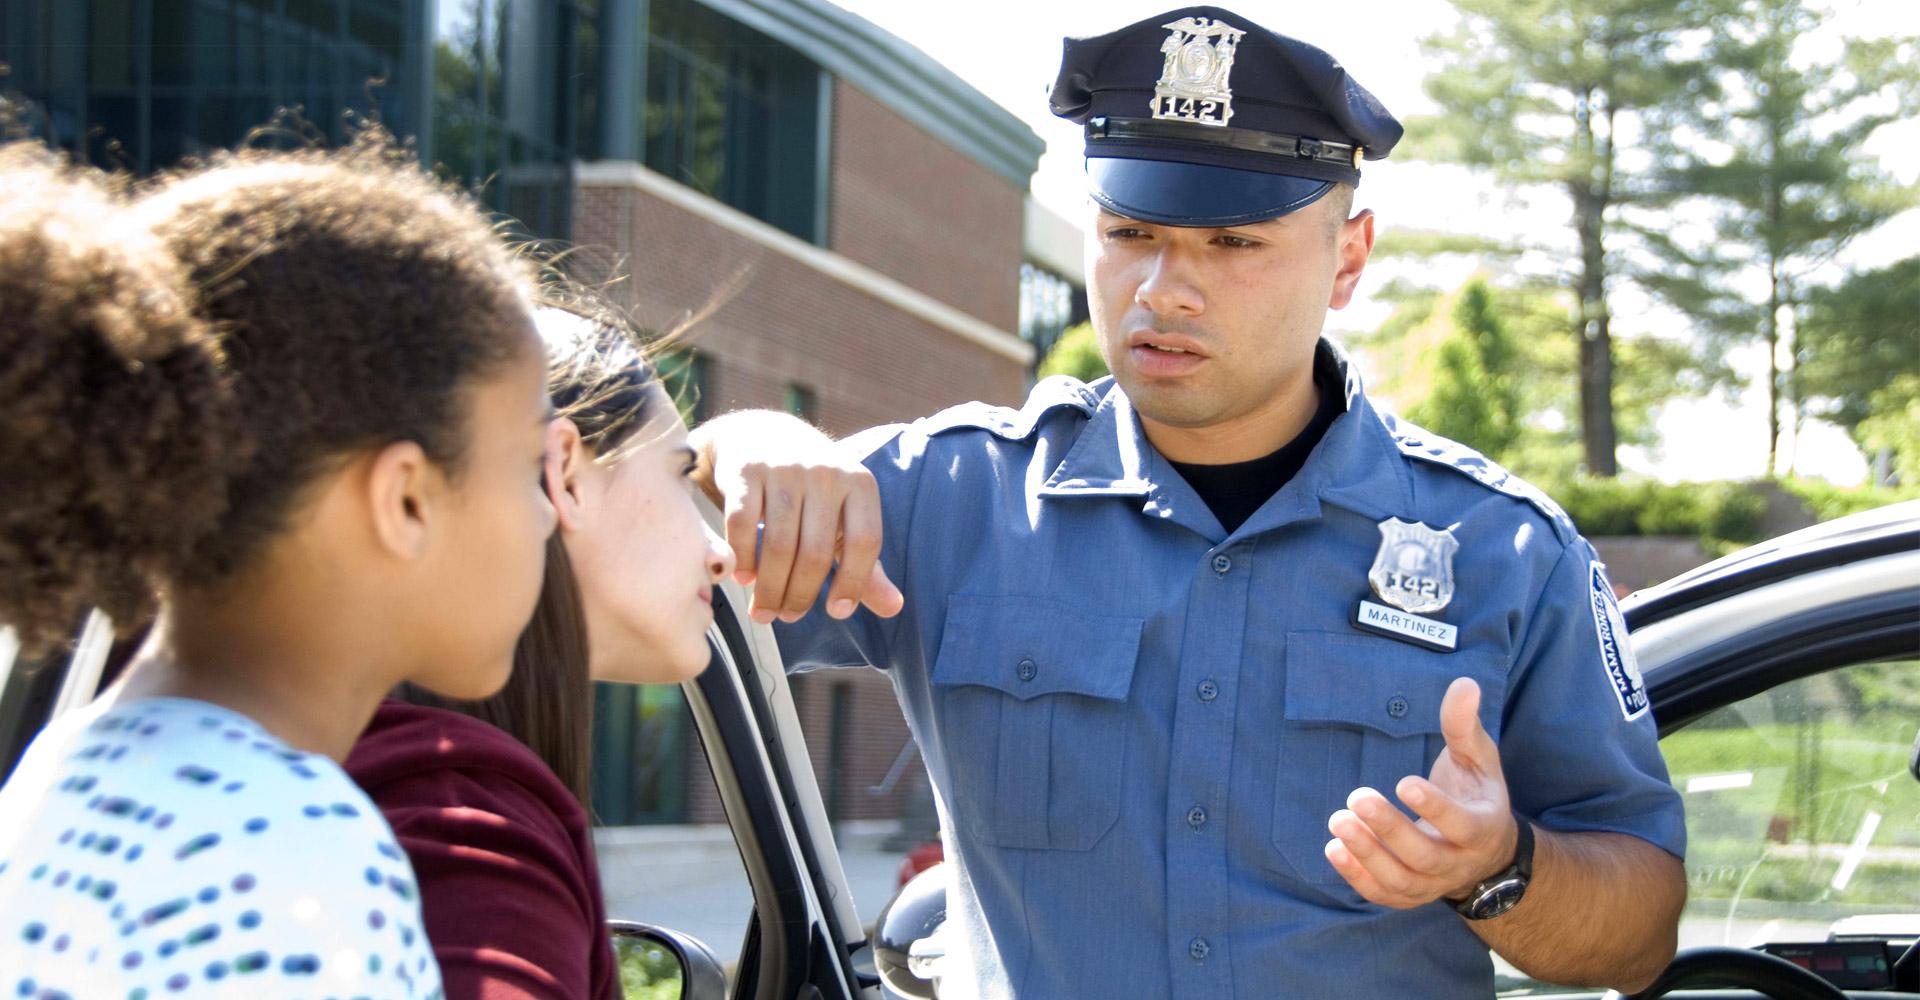 Social Media Surveillance By Law Enforcement | Avast